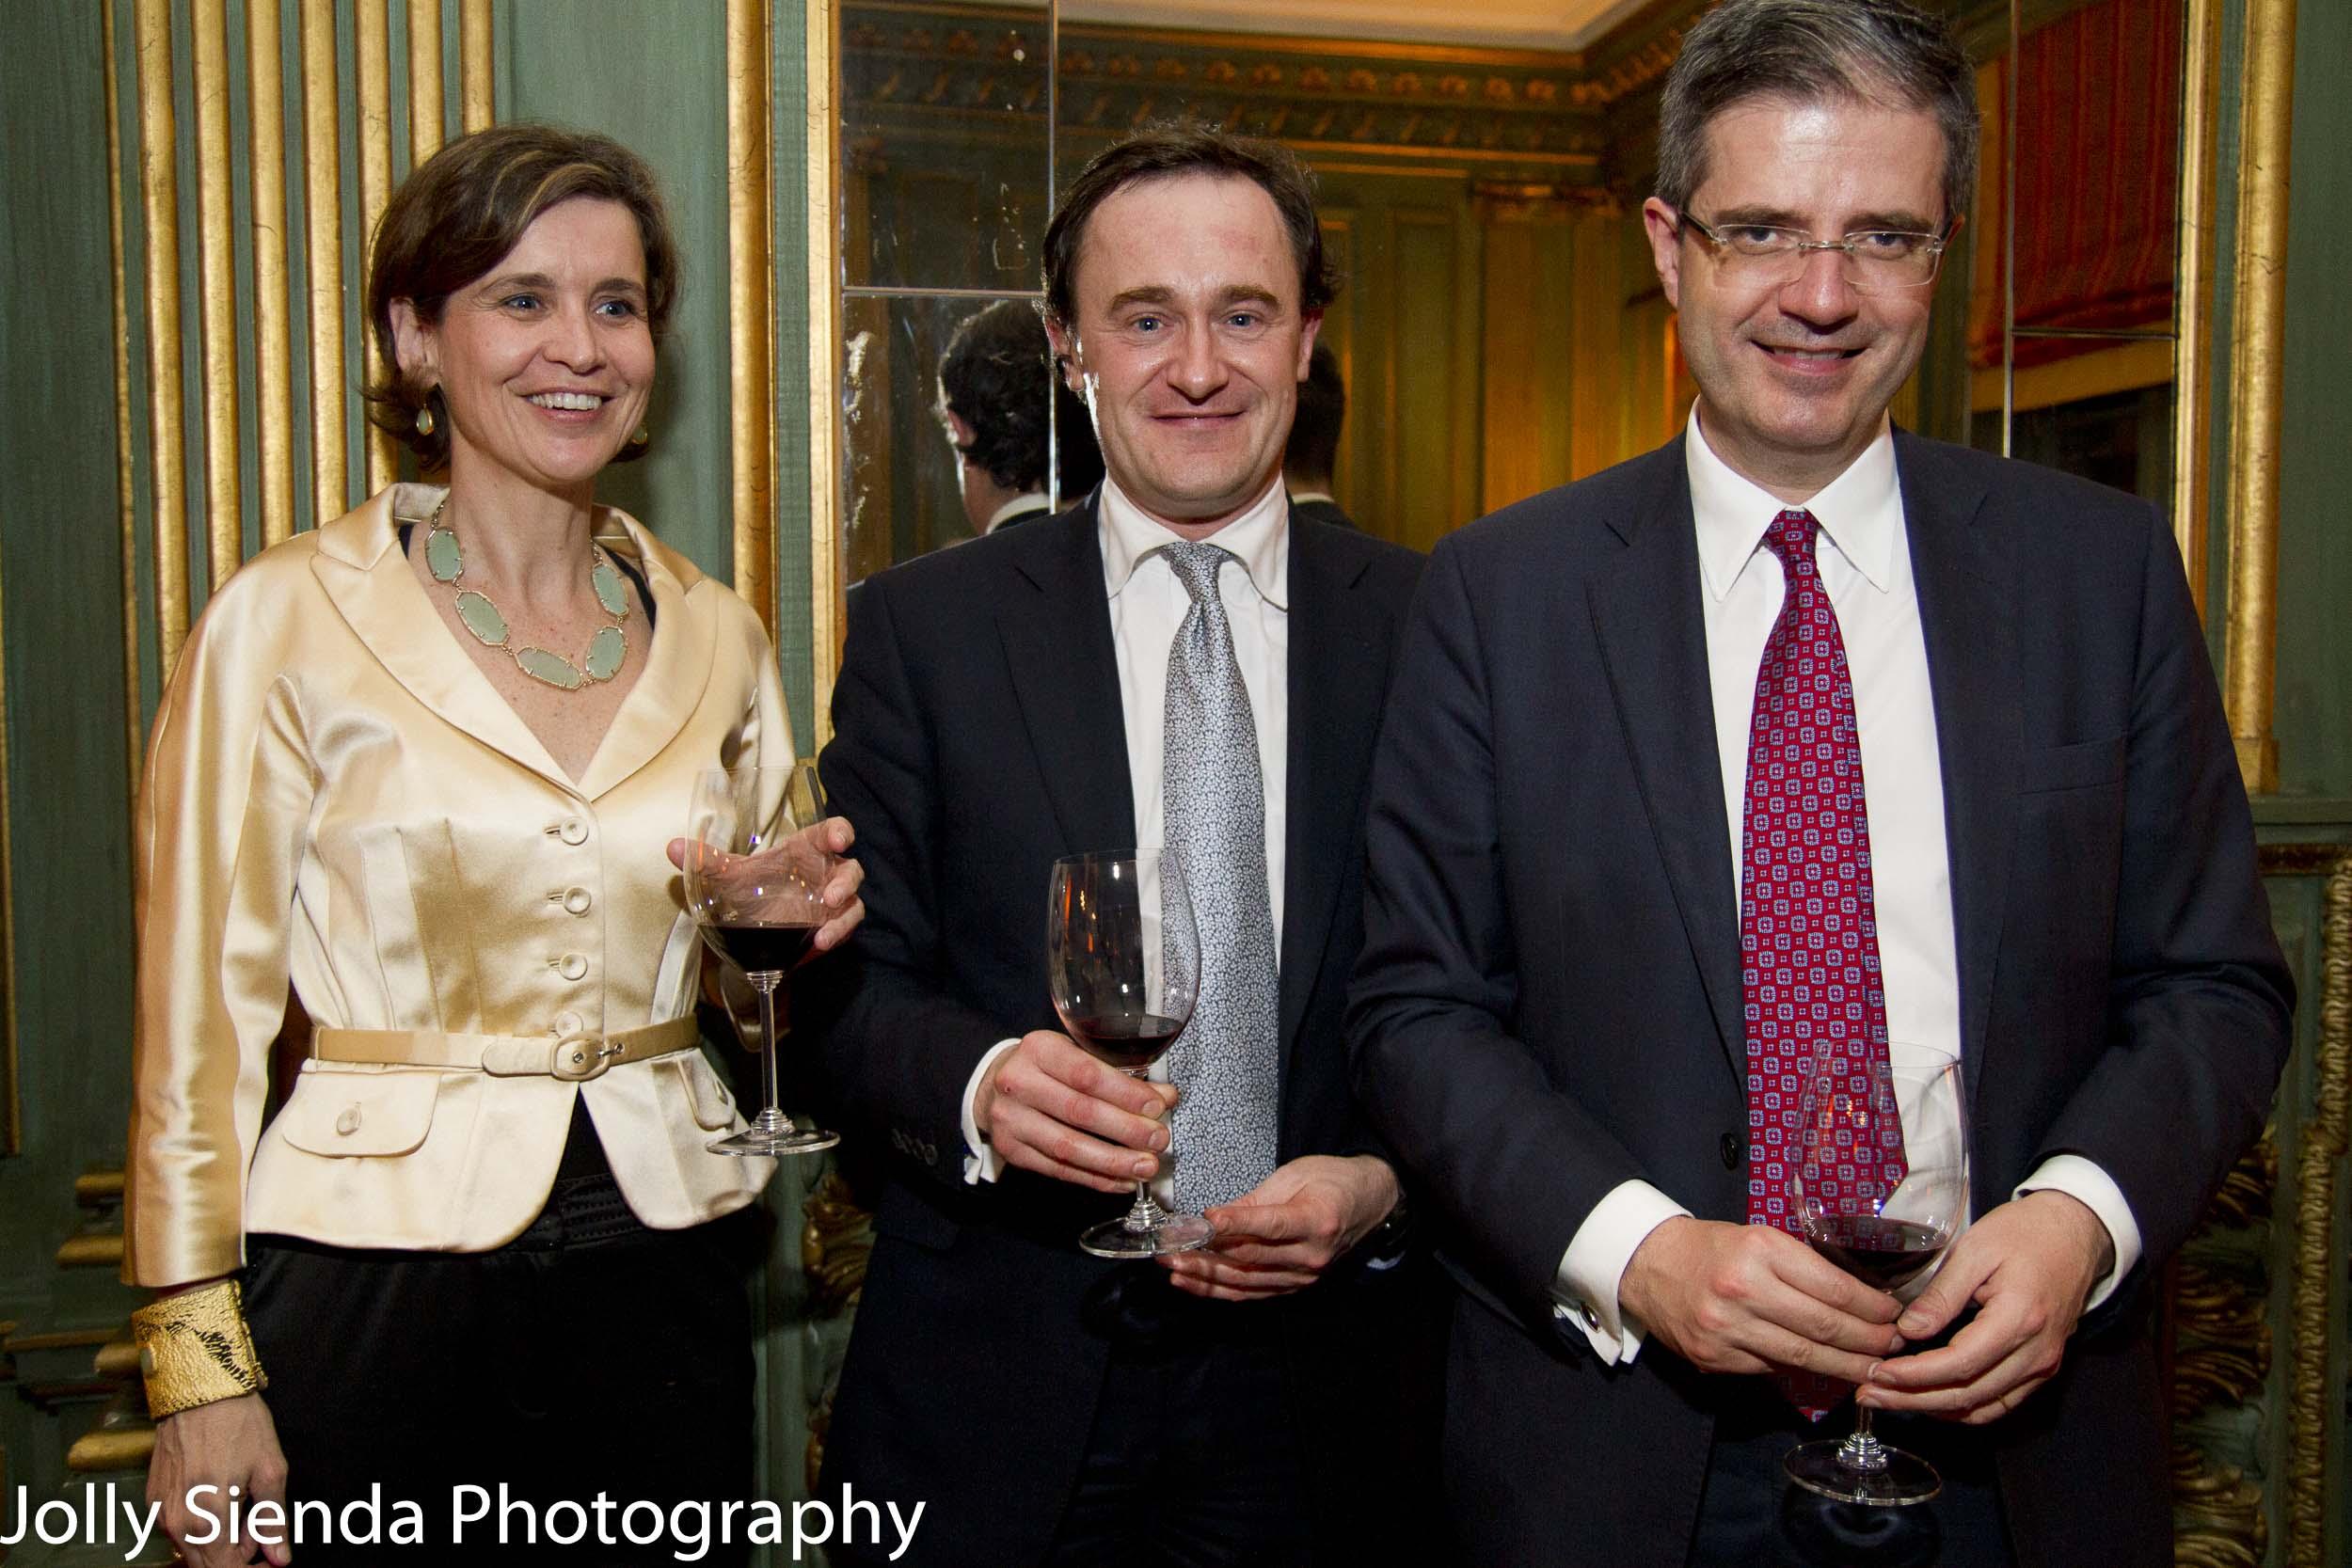 French Ambassadors Dinner, Heart's Delight Wine Auction